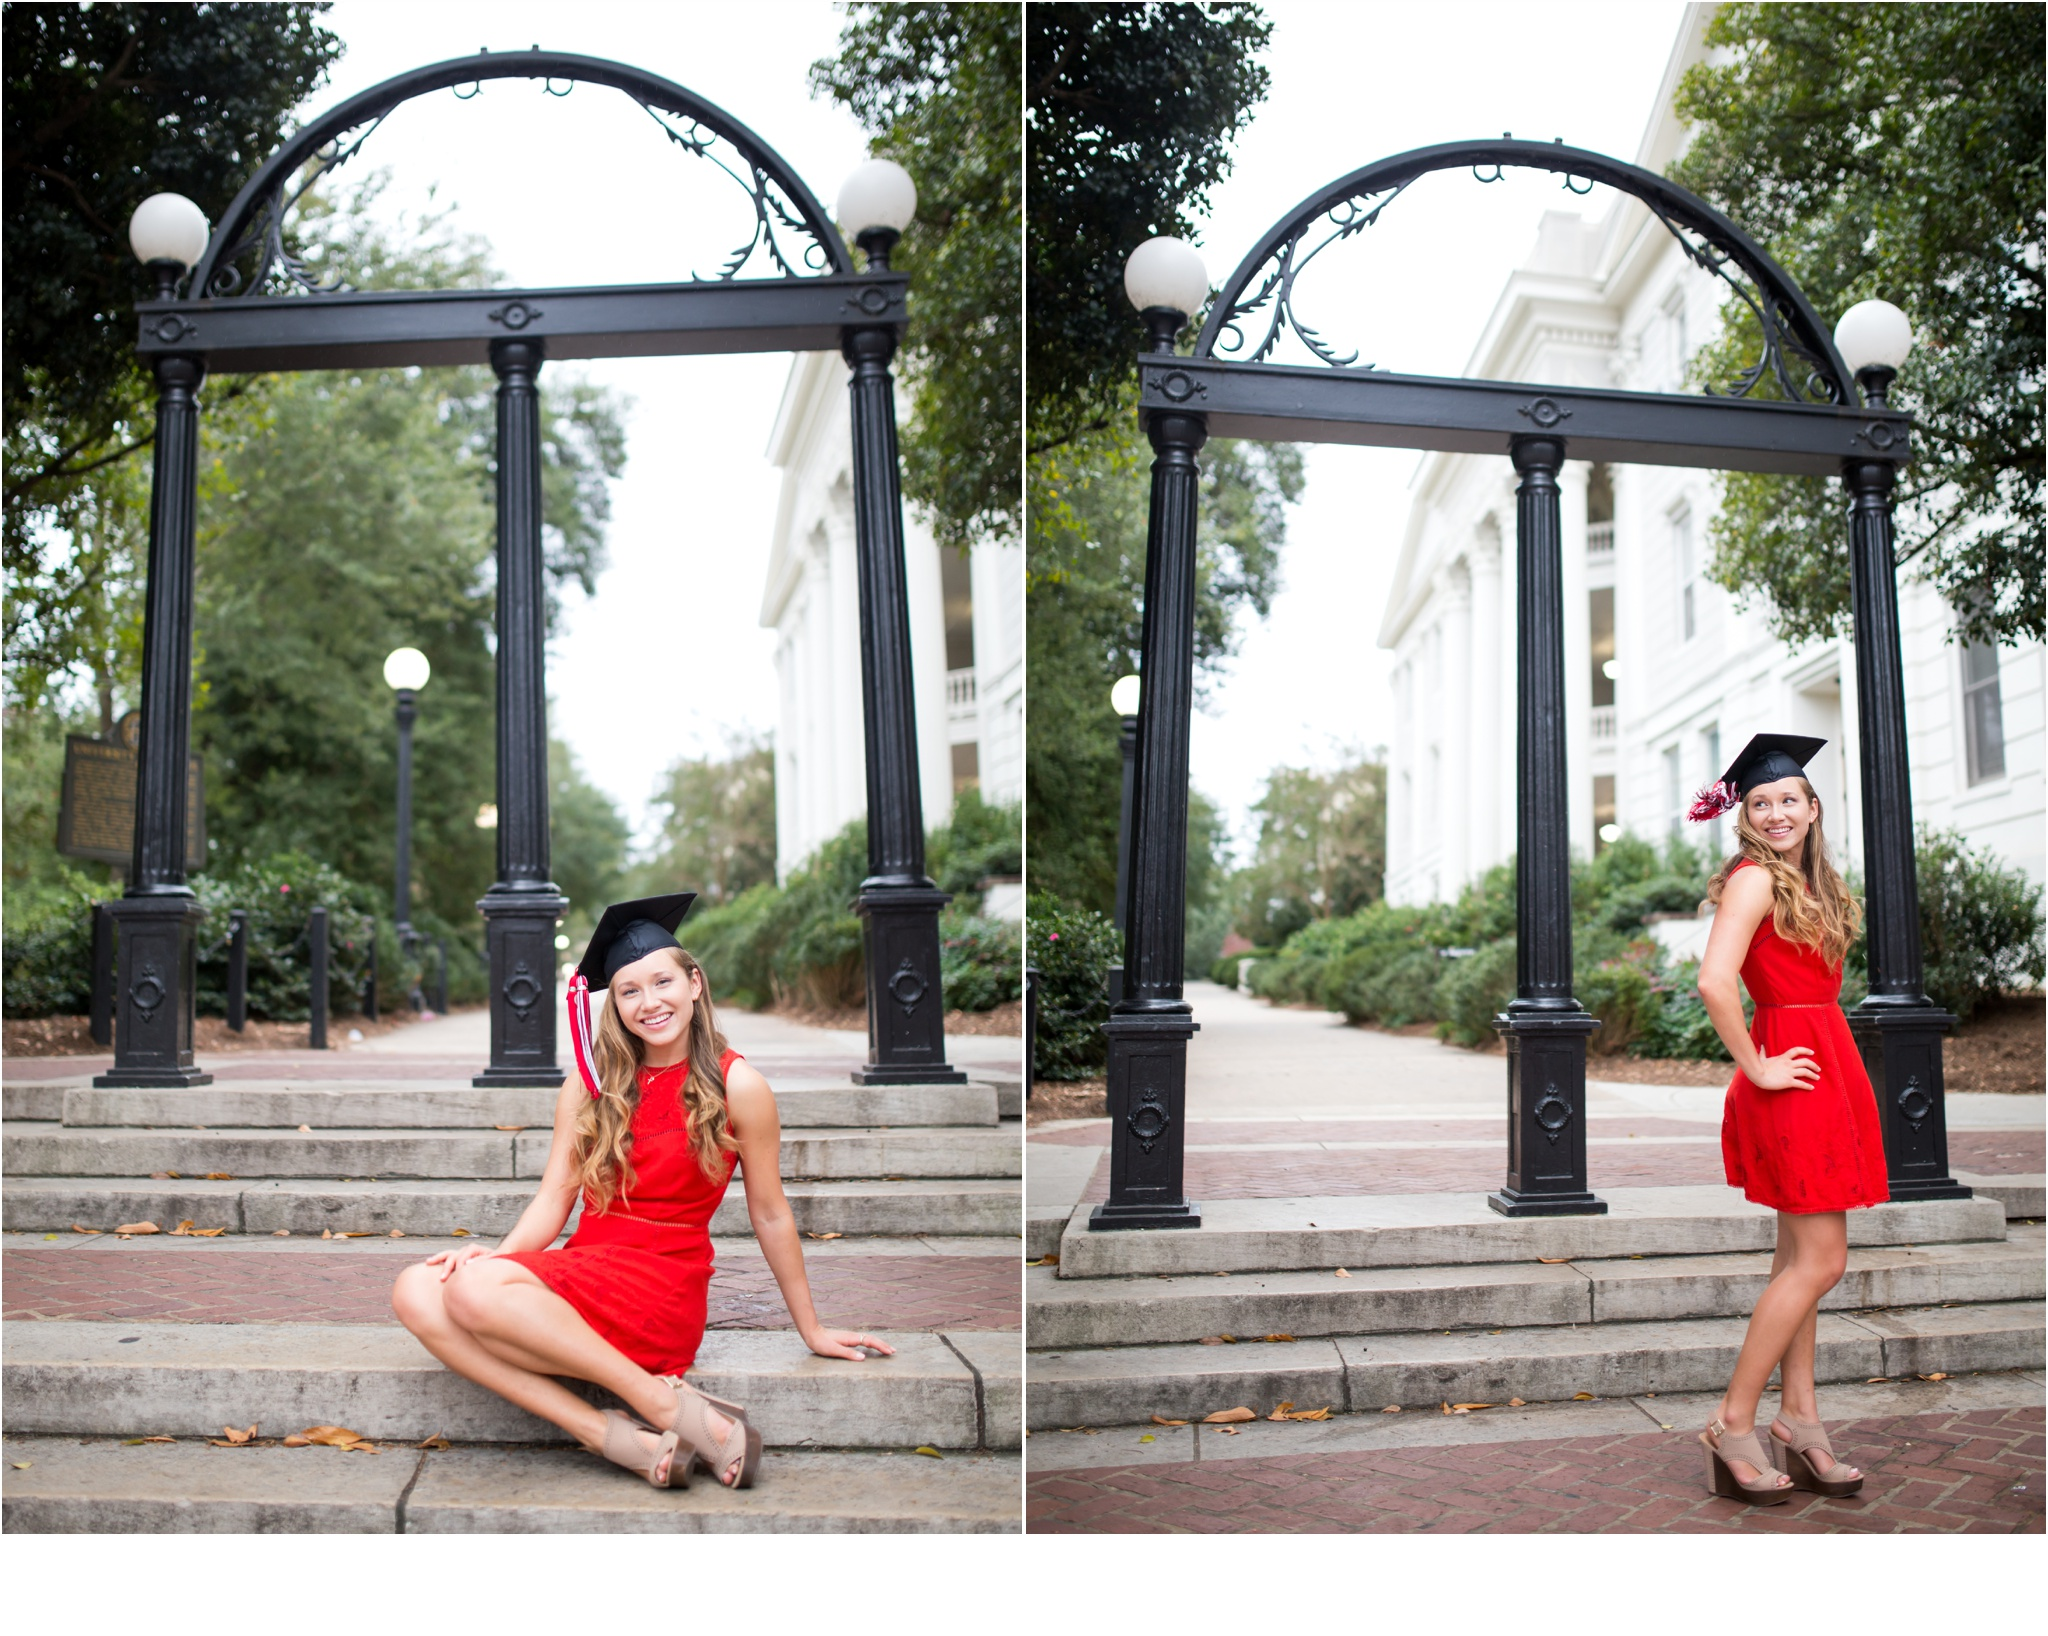 Rainey_Gregg_Photography_St._Simons_Island_Georgia_California_Wedding_Portrait_Photography_0285.jpg